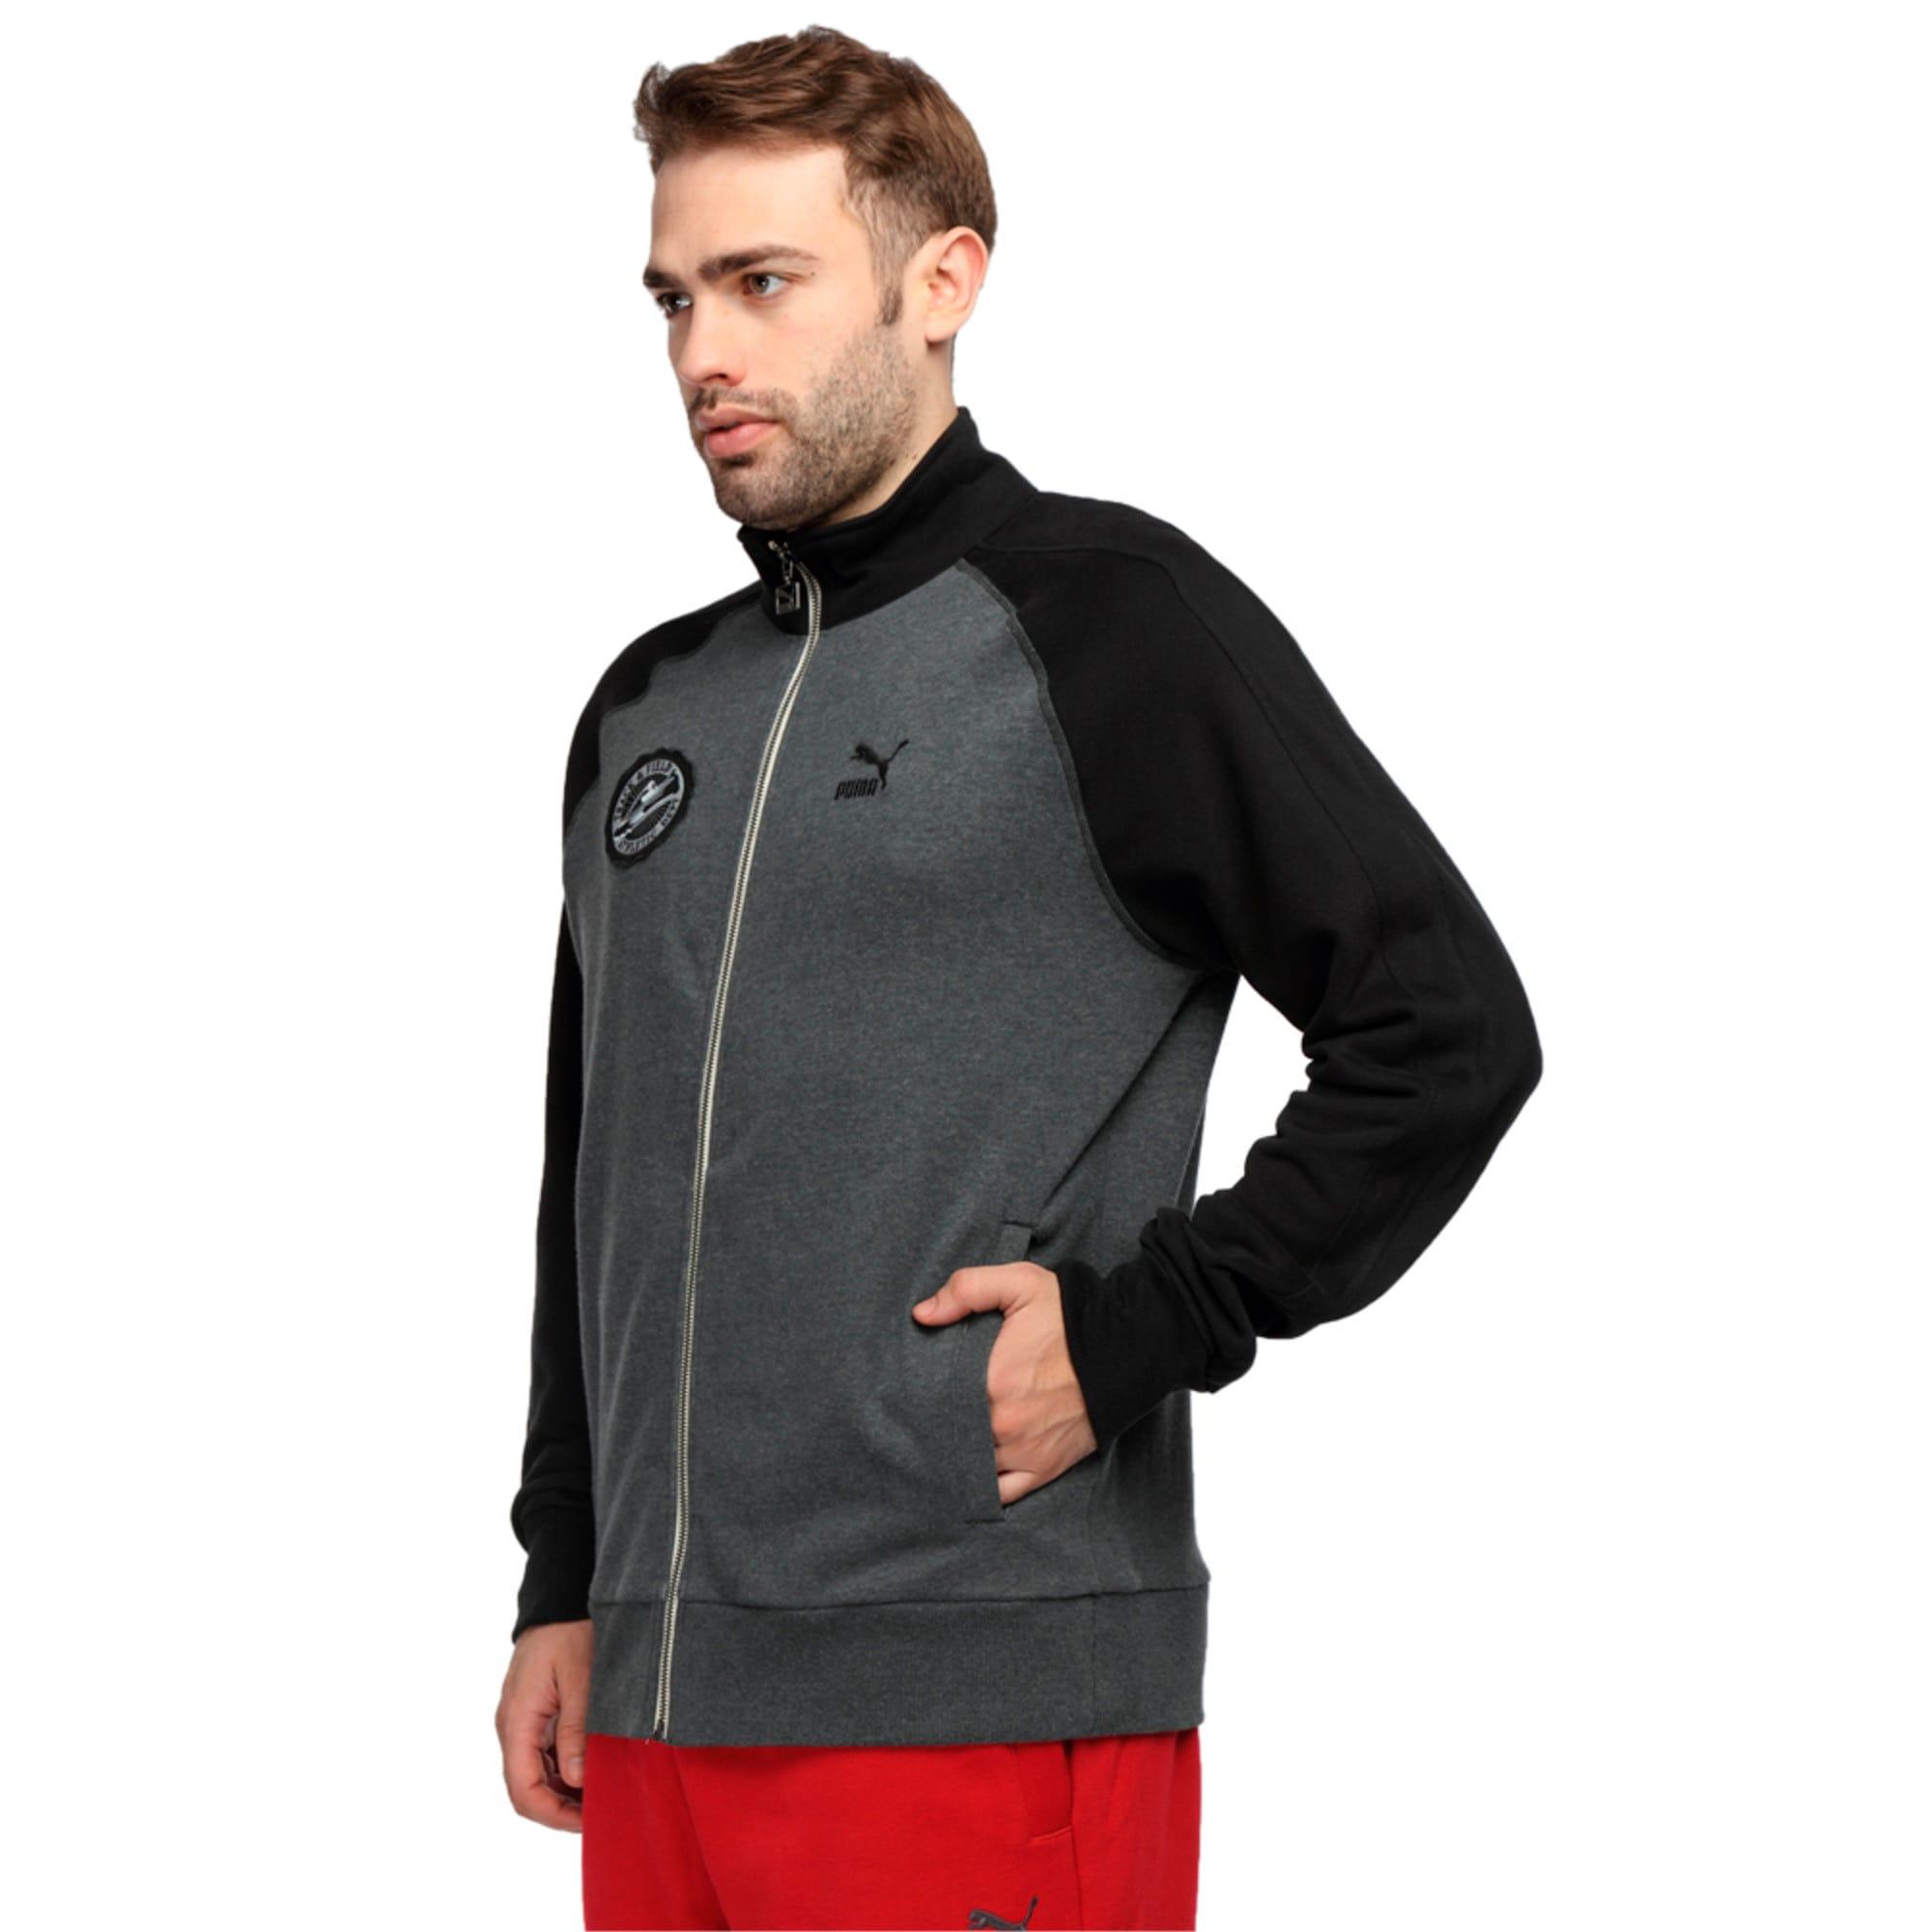 Thumbnail 1 of Varsity Track Jacket, dark gray heather, medium-IND